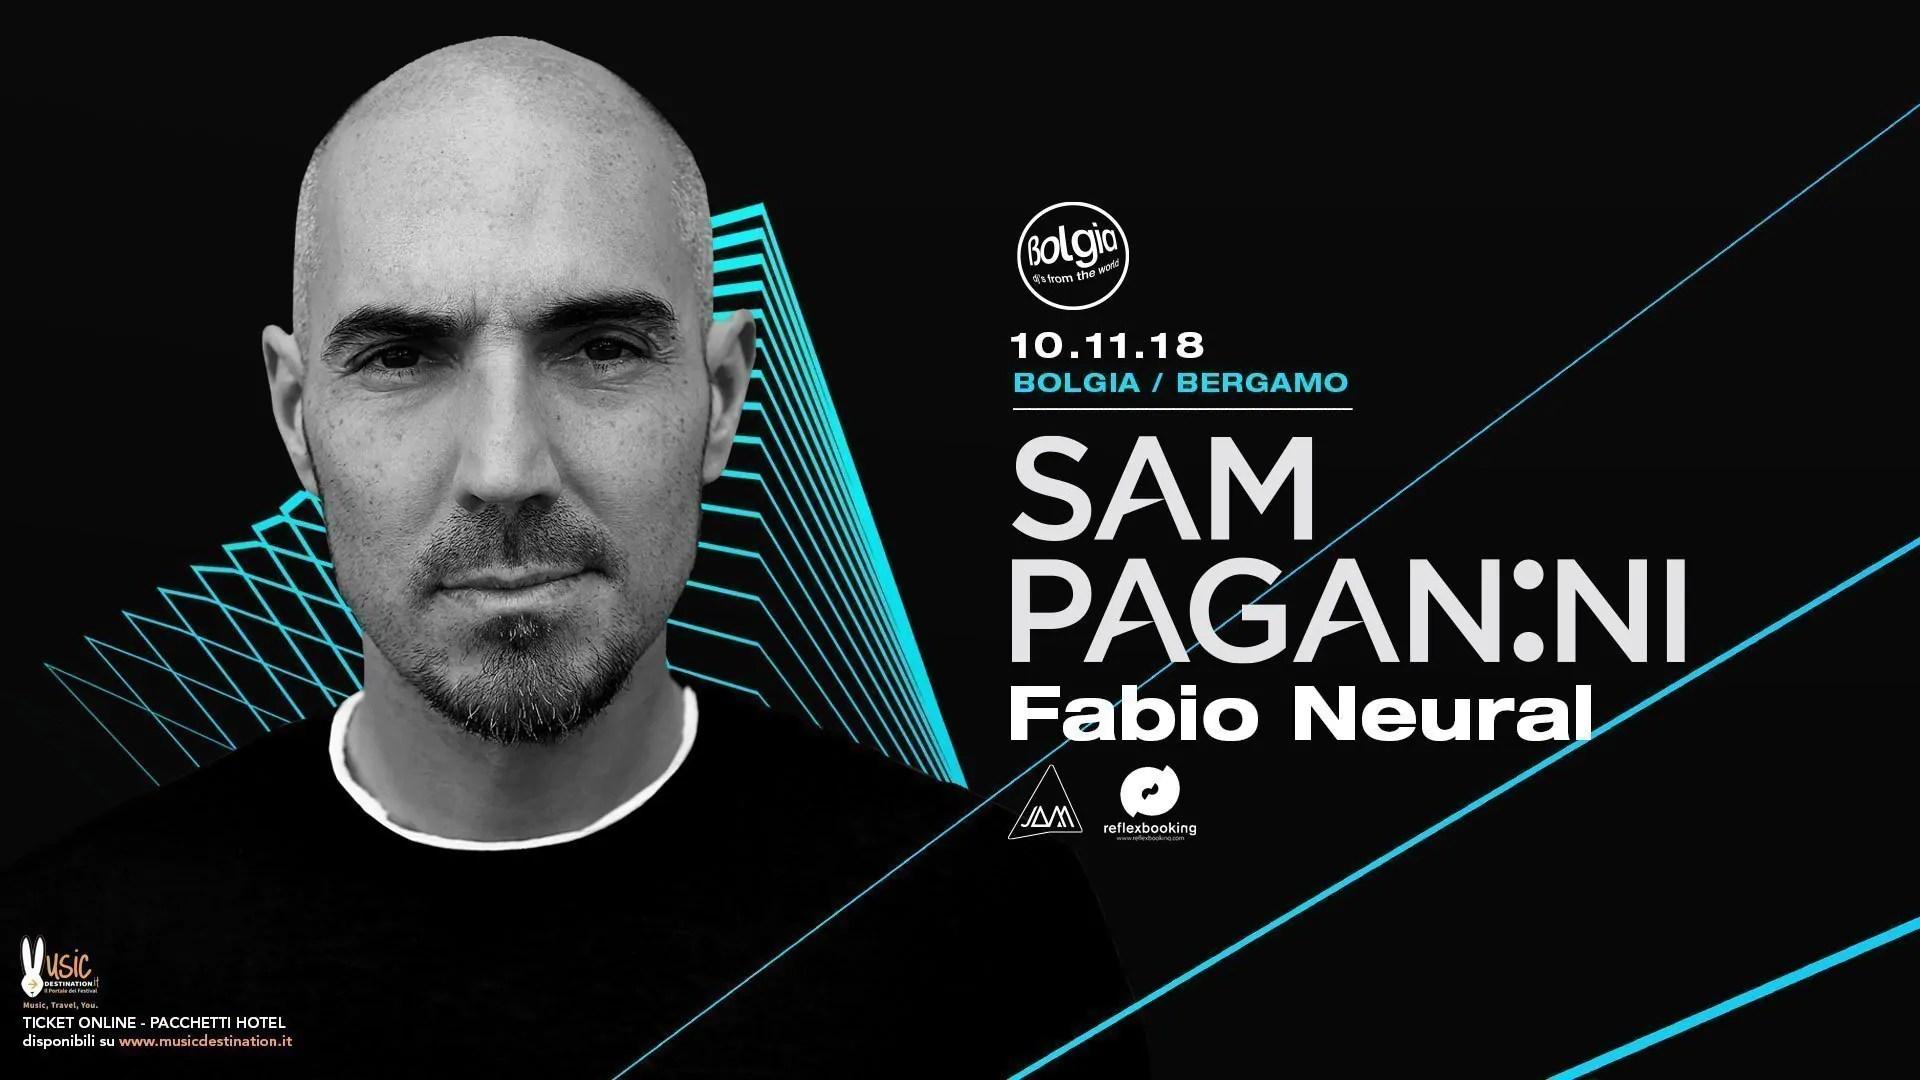 Bolgia Bergamo Sam Paganini 10 Novembre 2018 | Ticket Tavoli Pacchetti hotel Prevendite